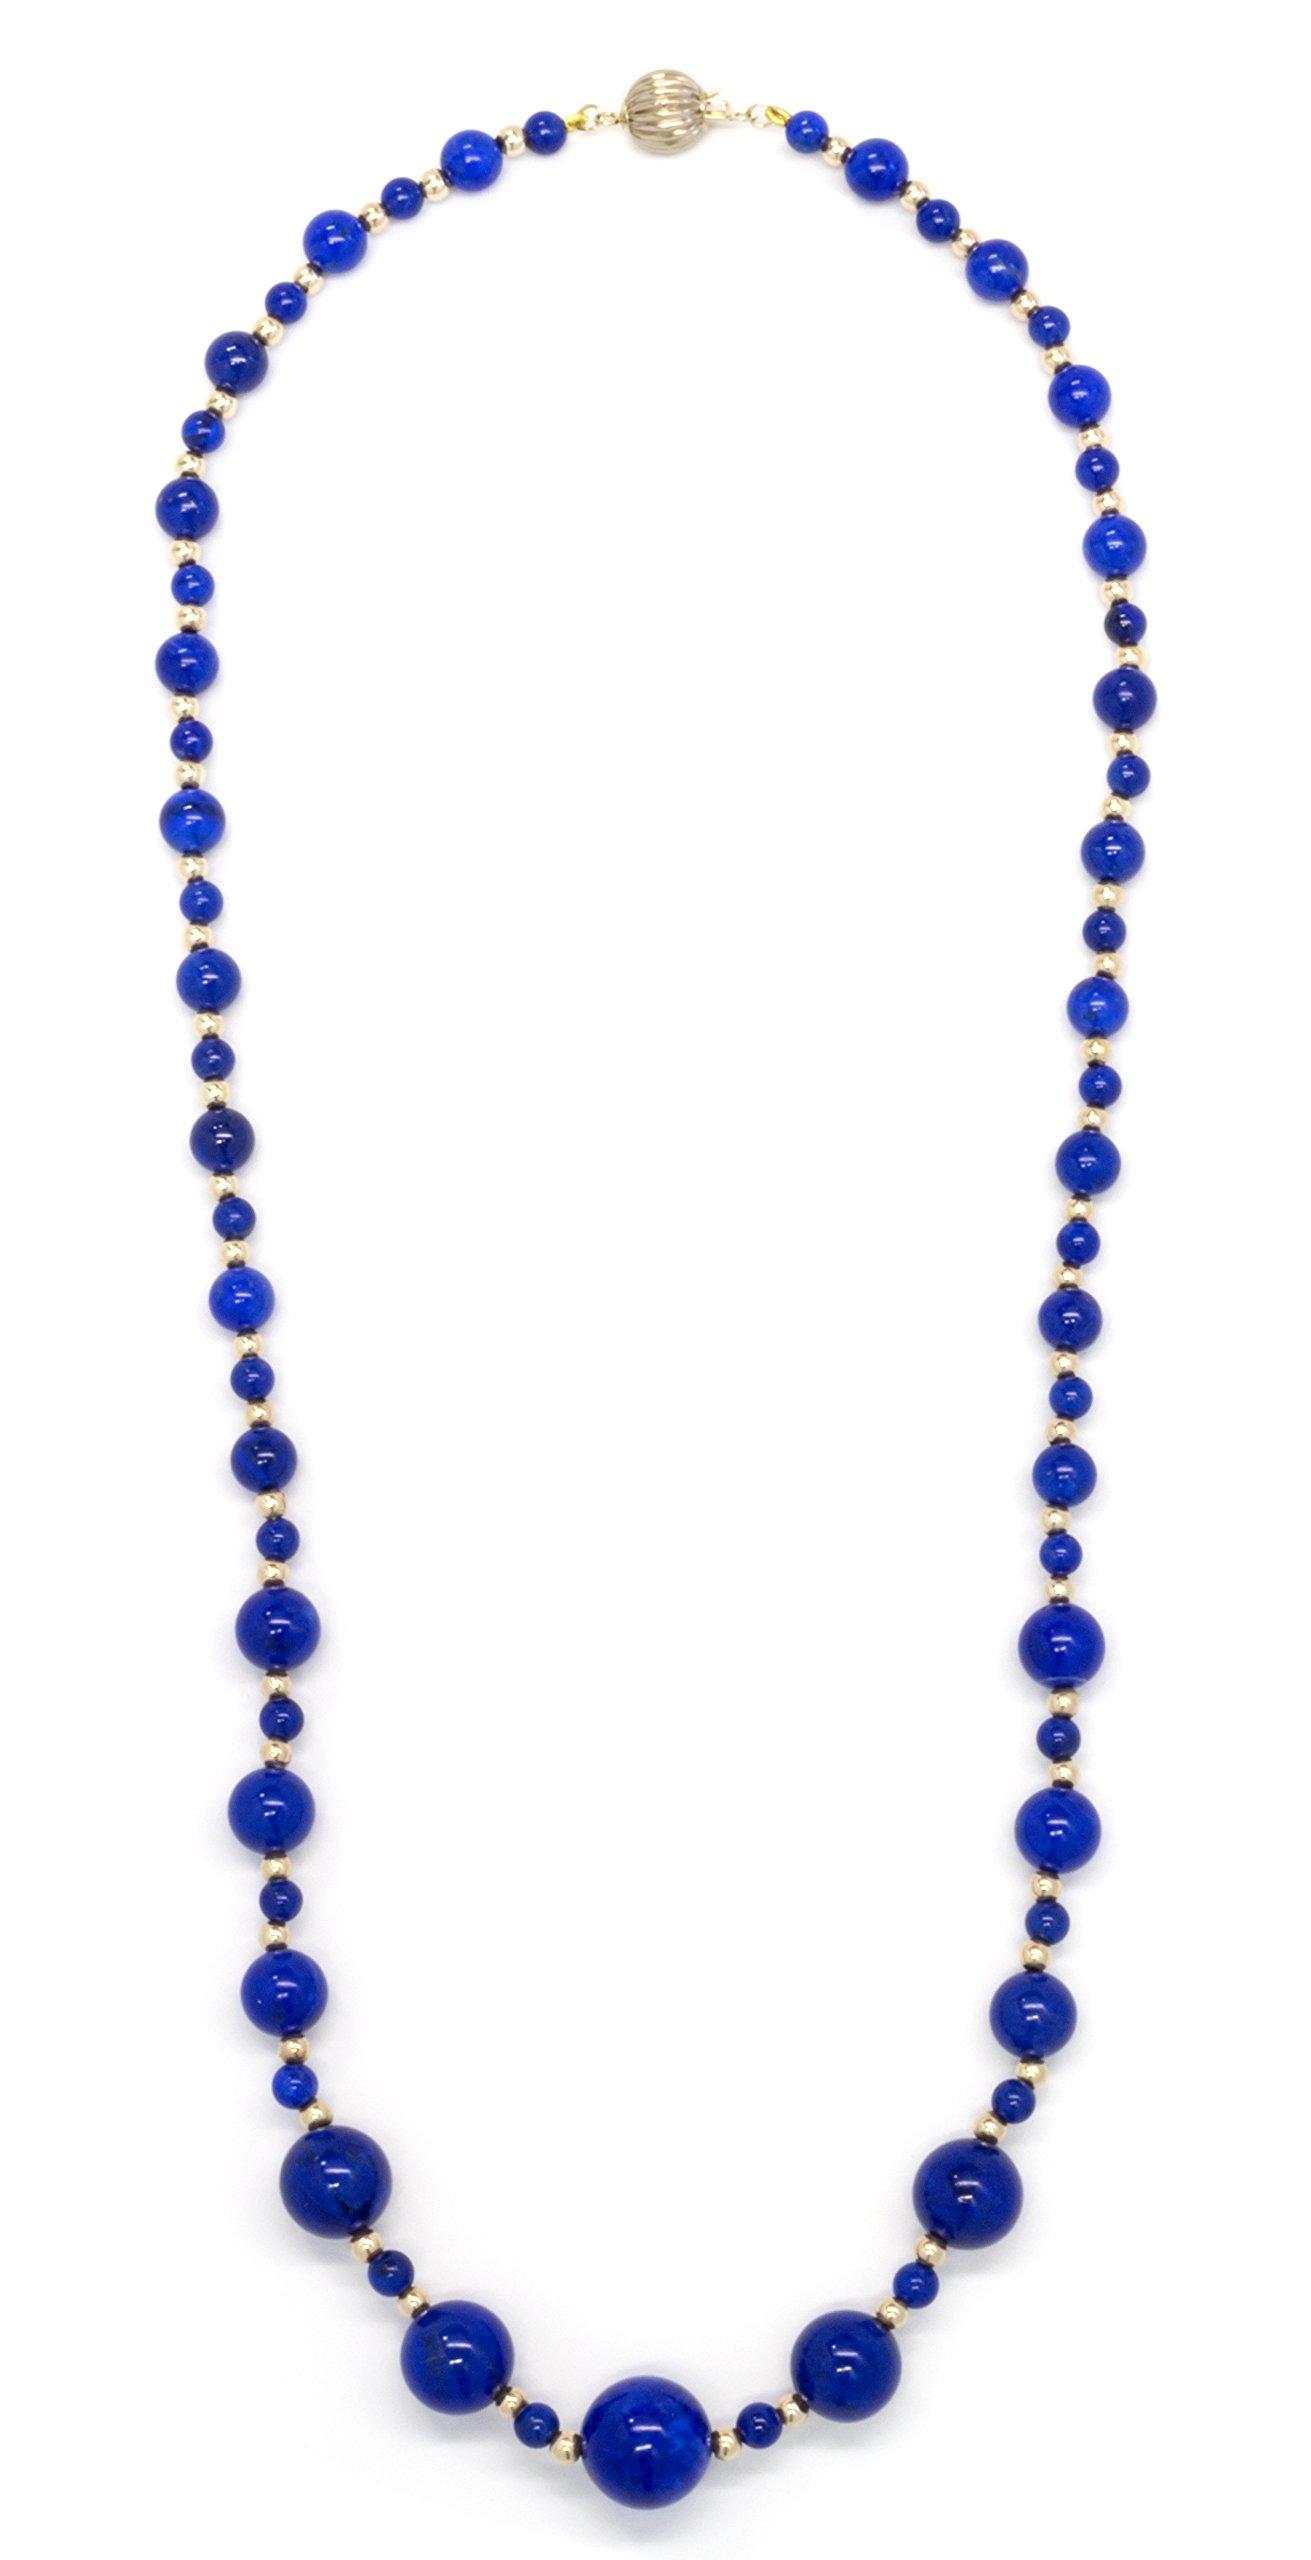 ISAAC WESTMAN 14K Yellow Gold Graduated Lapis Lazuli Gemstone Beaded Necklace | 20'' Matinee Length by ISAAC WESTMAN (Image #3)